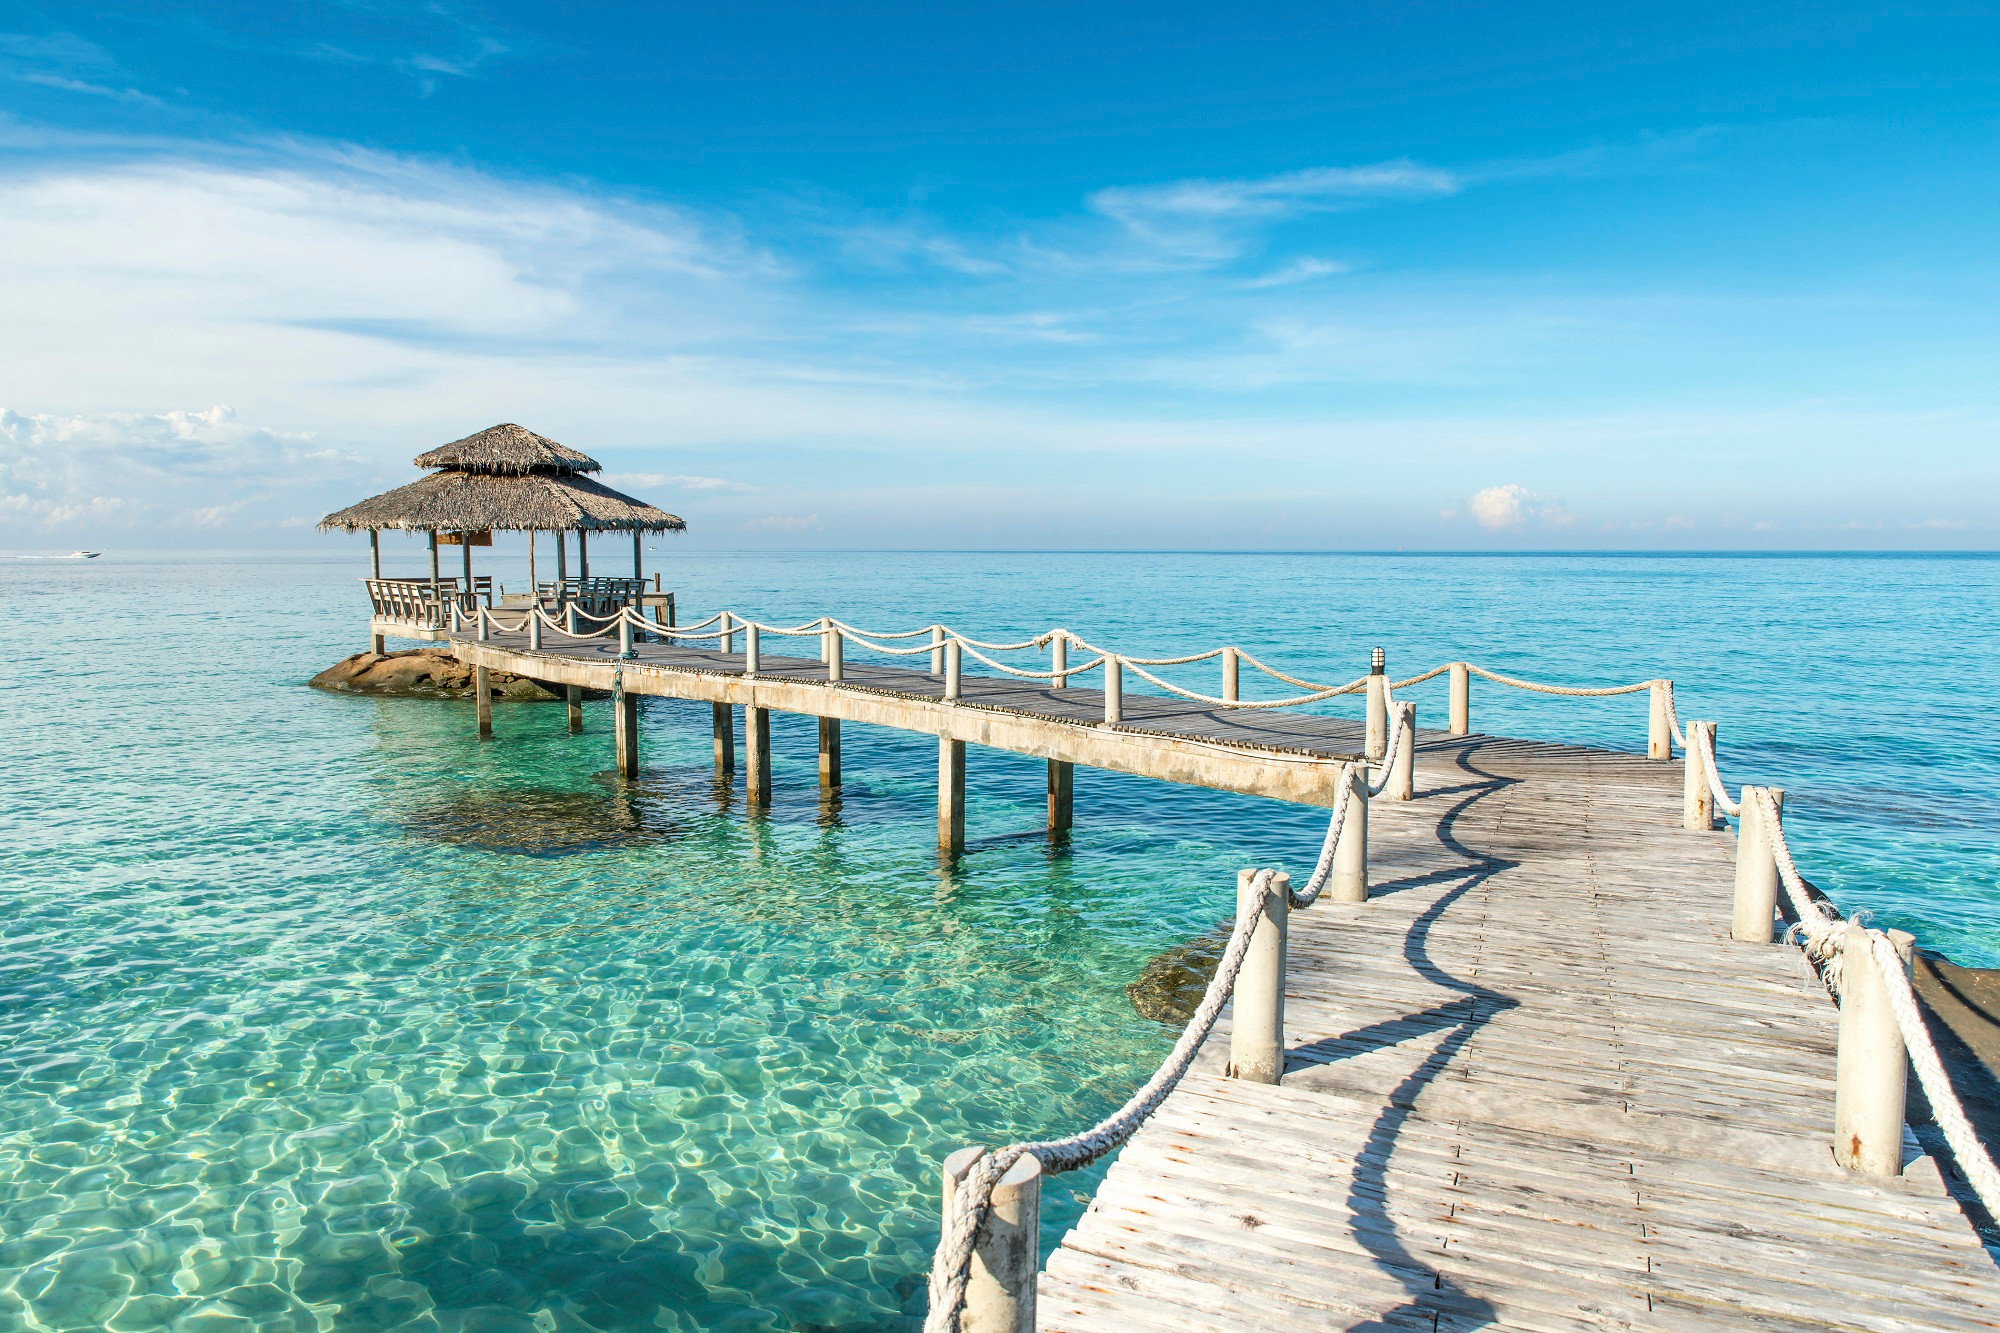 THAILAND TOUR PACKAGE 2020